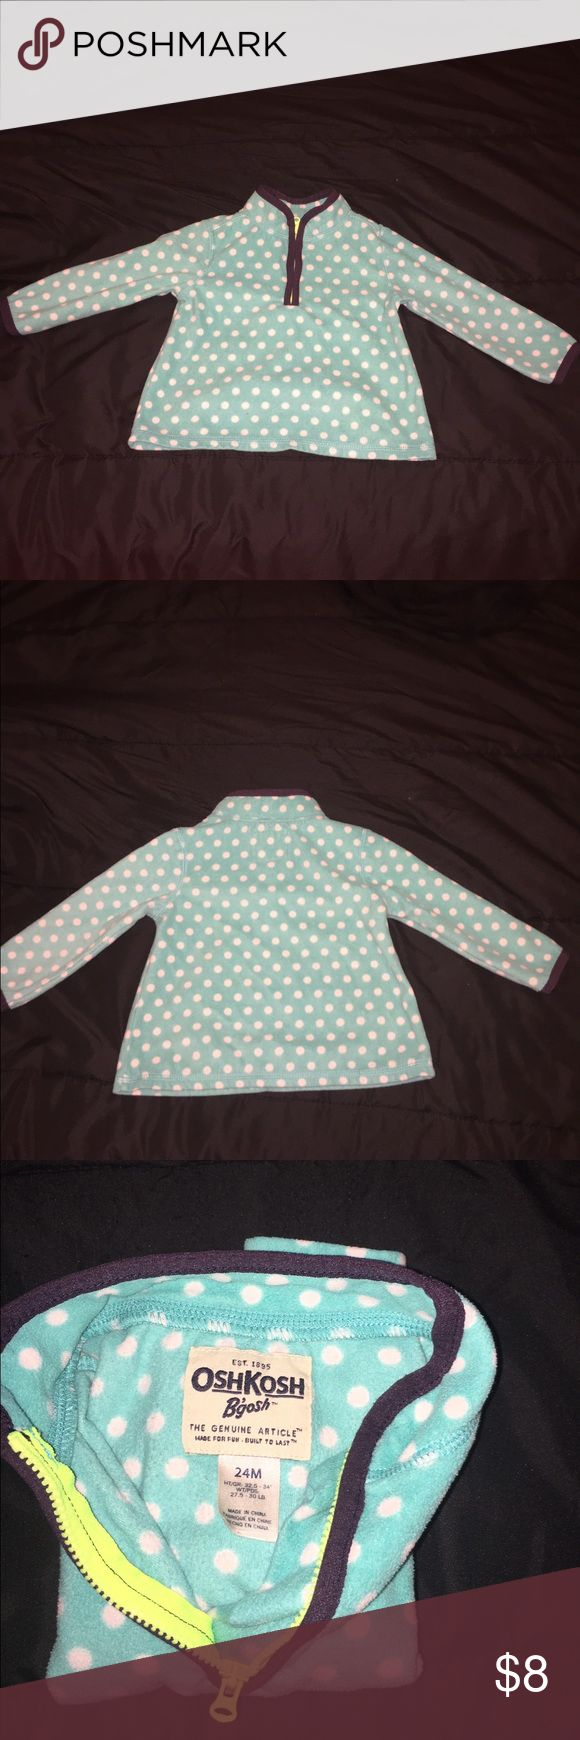 Girls polka dot fleece pullover Girls polka dot Oshkosh B'Gosh pullover | Size 24M | Good Condition Shirts & Tops Sweatshirts & Hoodies